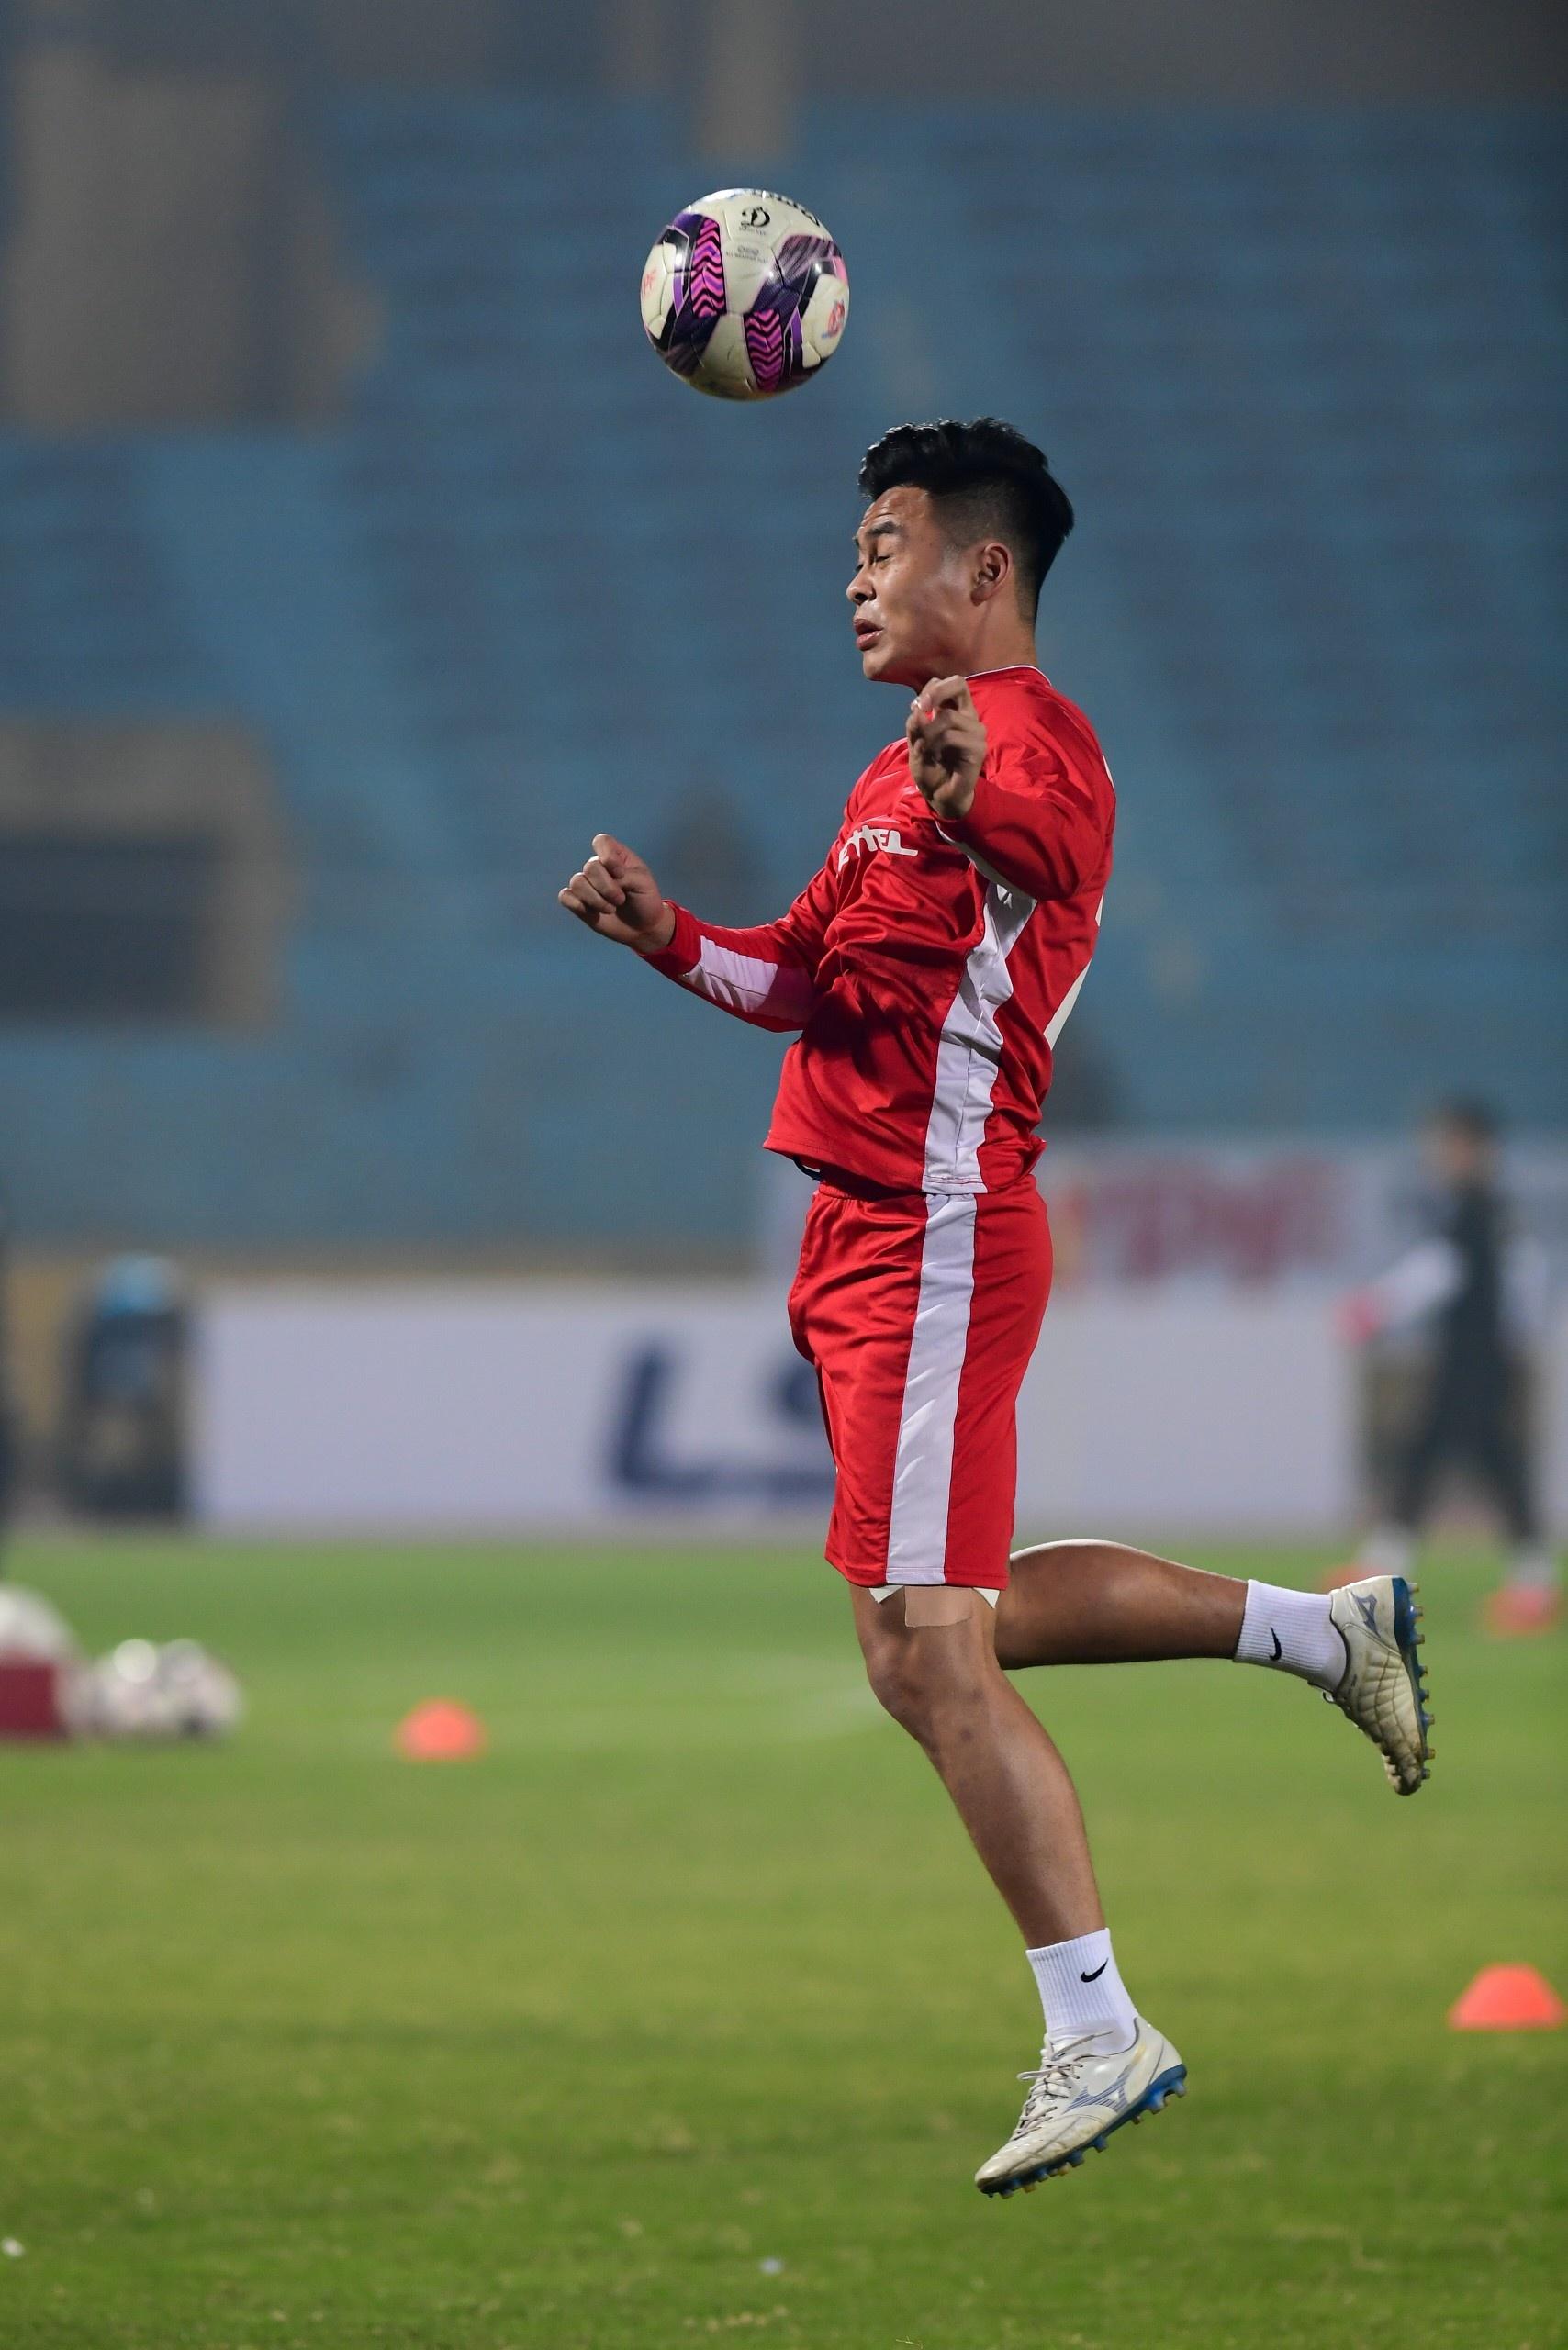 CLB Viettel vs Hai Phong anh 2